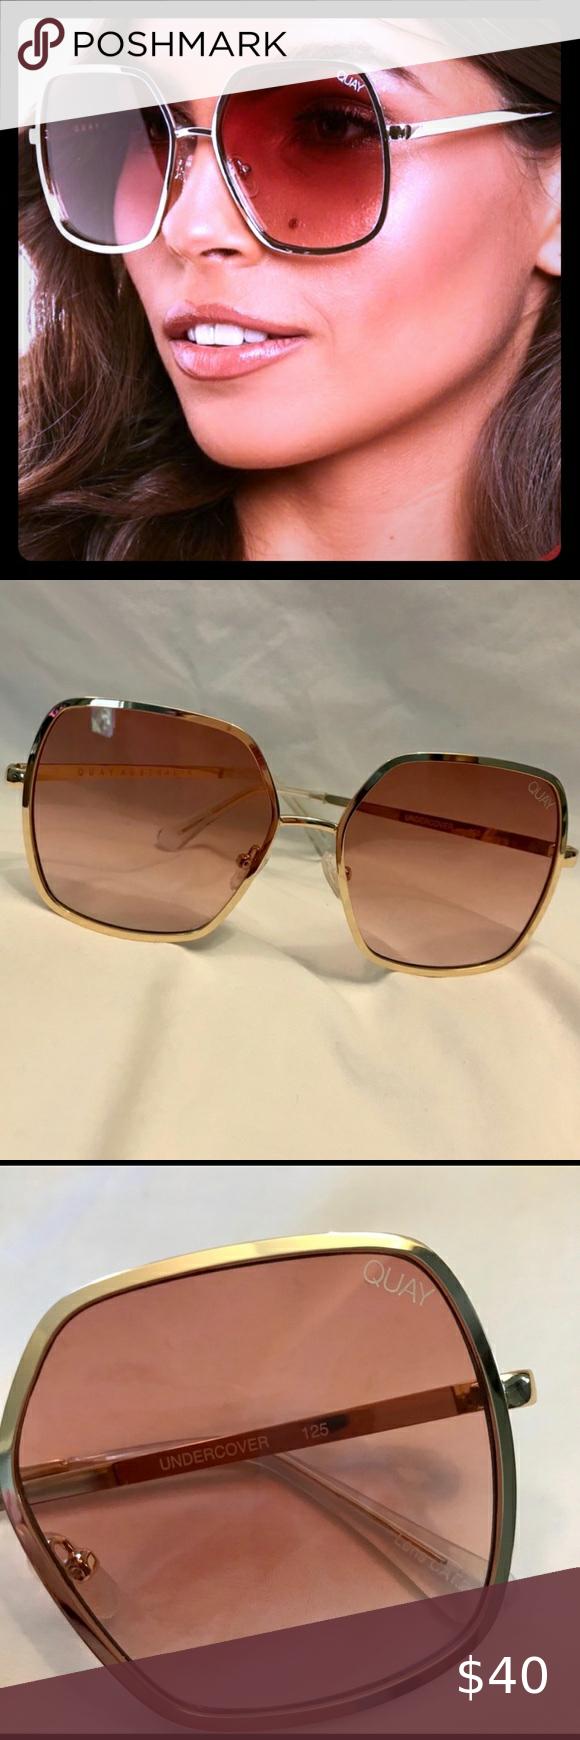 Quay Undercover Large Square Stop Starr Desi Jlo In 2020 Sunglasses Accessories Jlo Oversized Sunnies